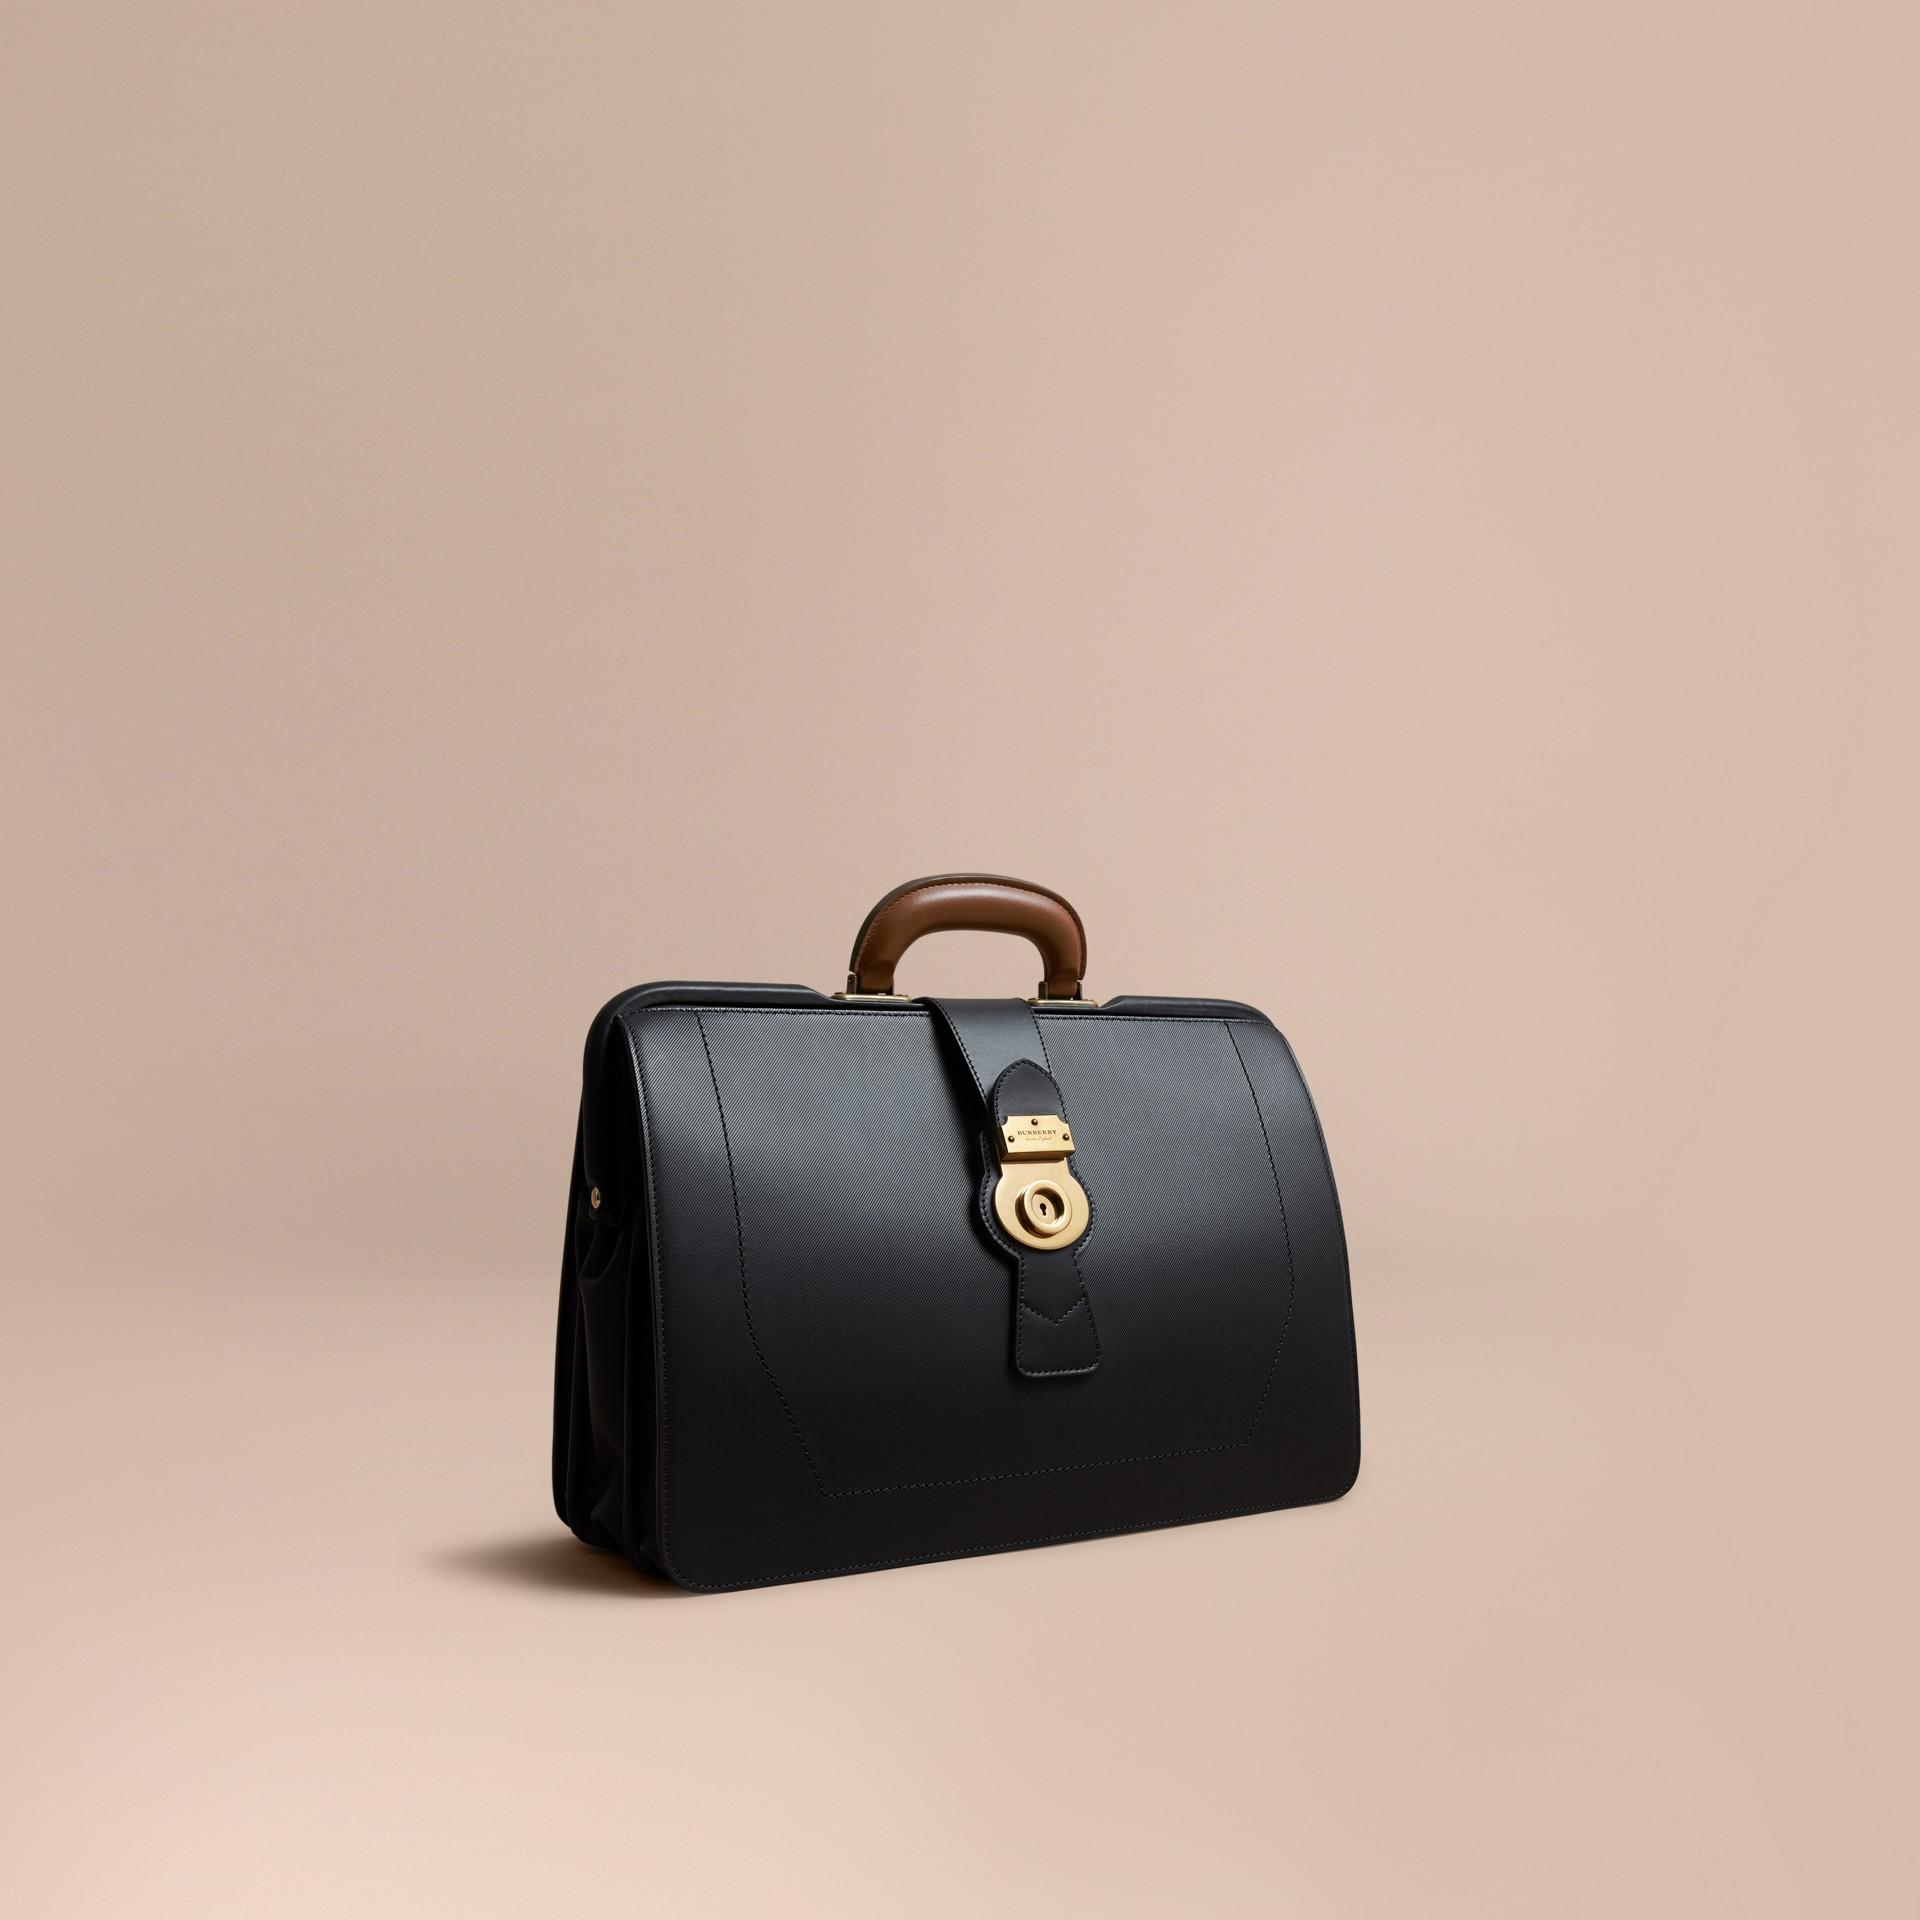 The DK88 Doctor's Bag Black - gallery image 1